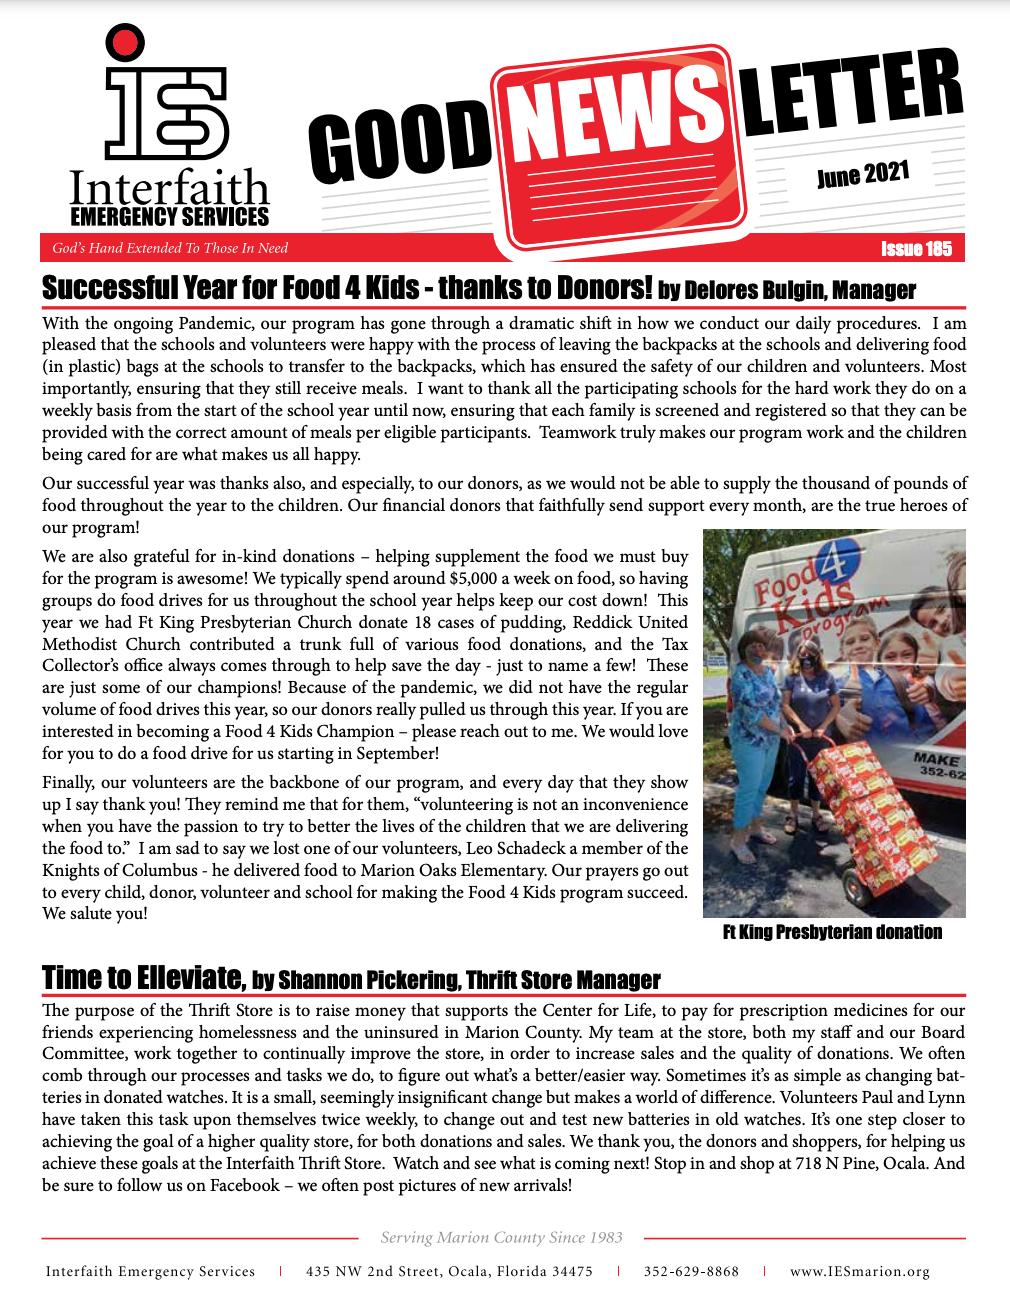 June 2021 IES Newsletter